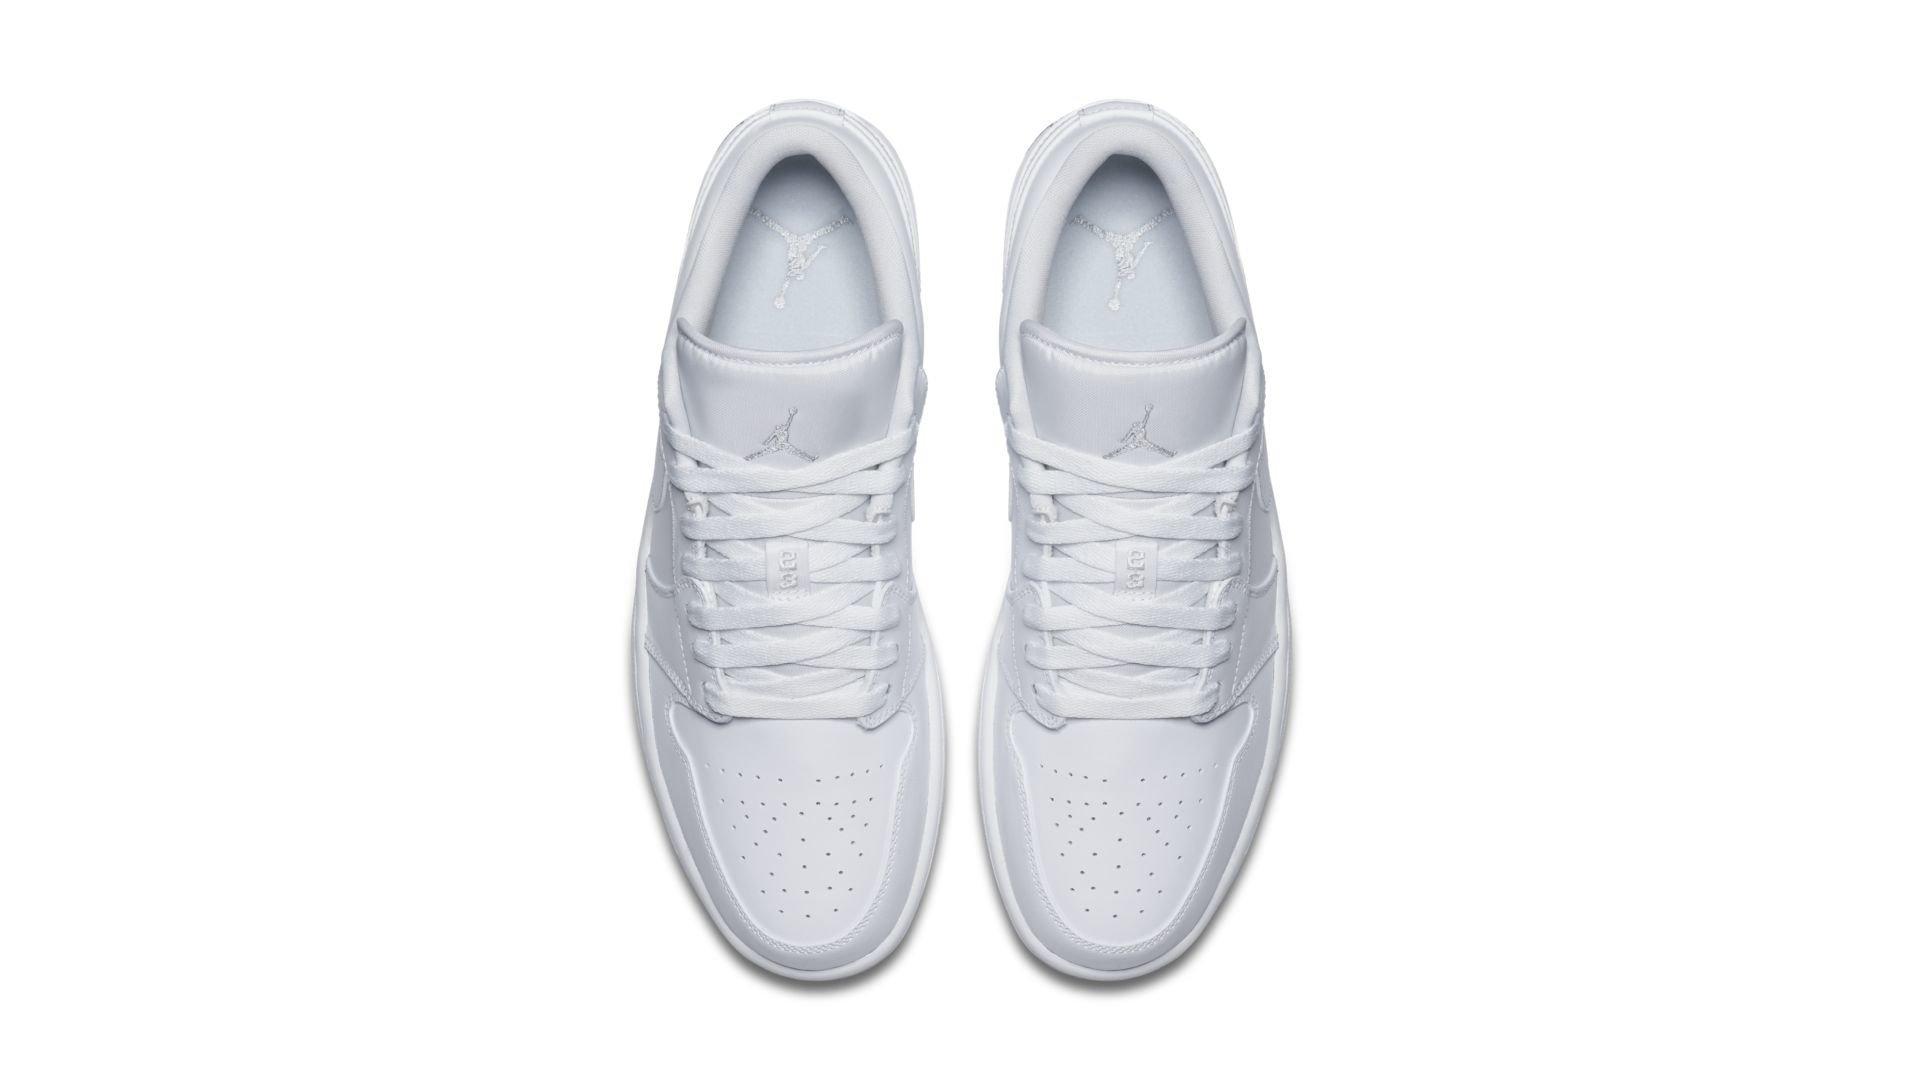 Jordan 1 Low White (2015) (553558-120)